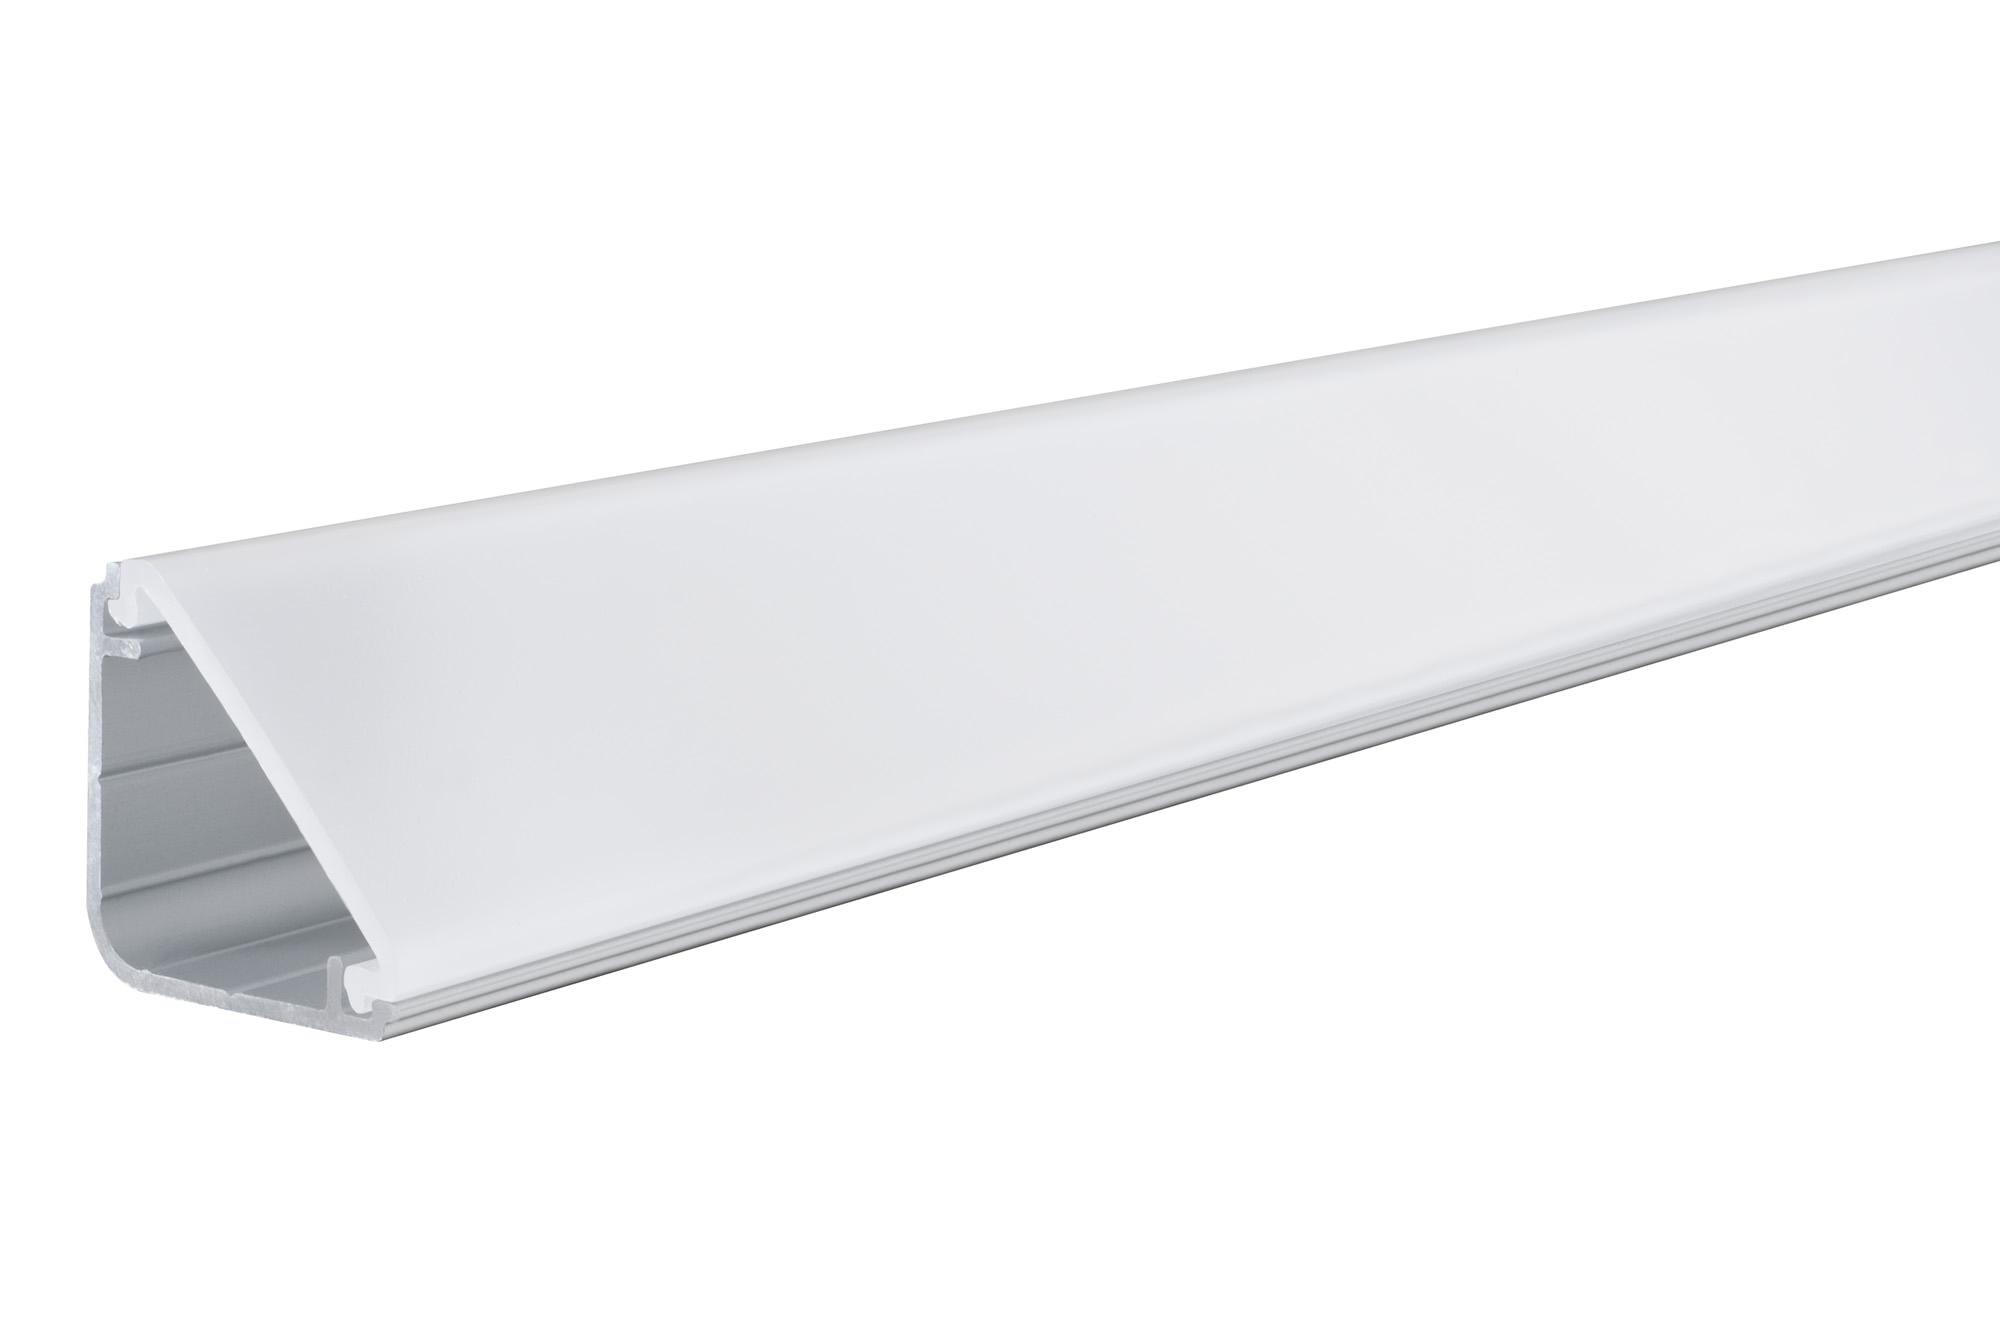 Paulmann. 70262 Профиль плинтус FN Delta Profil Diffusor 100cm Alu/Satin